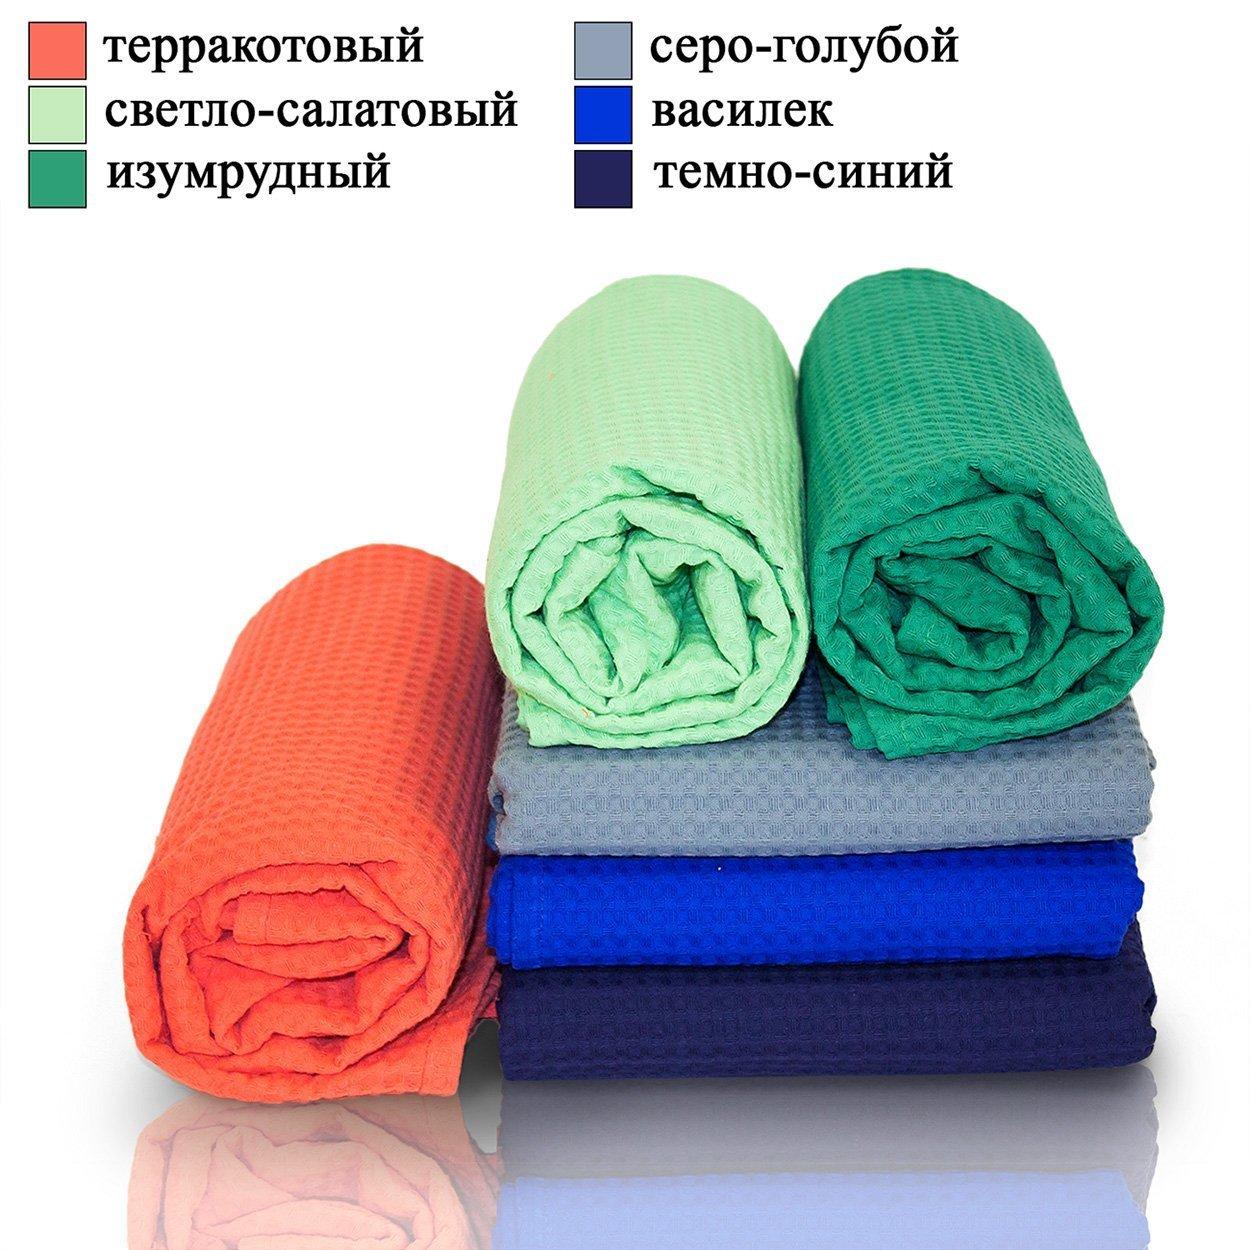 Полотенце вафельное банное Elin (желтый), Полотенце 80x150